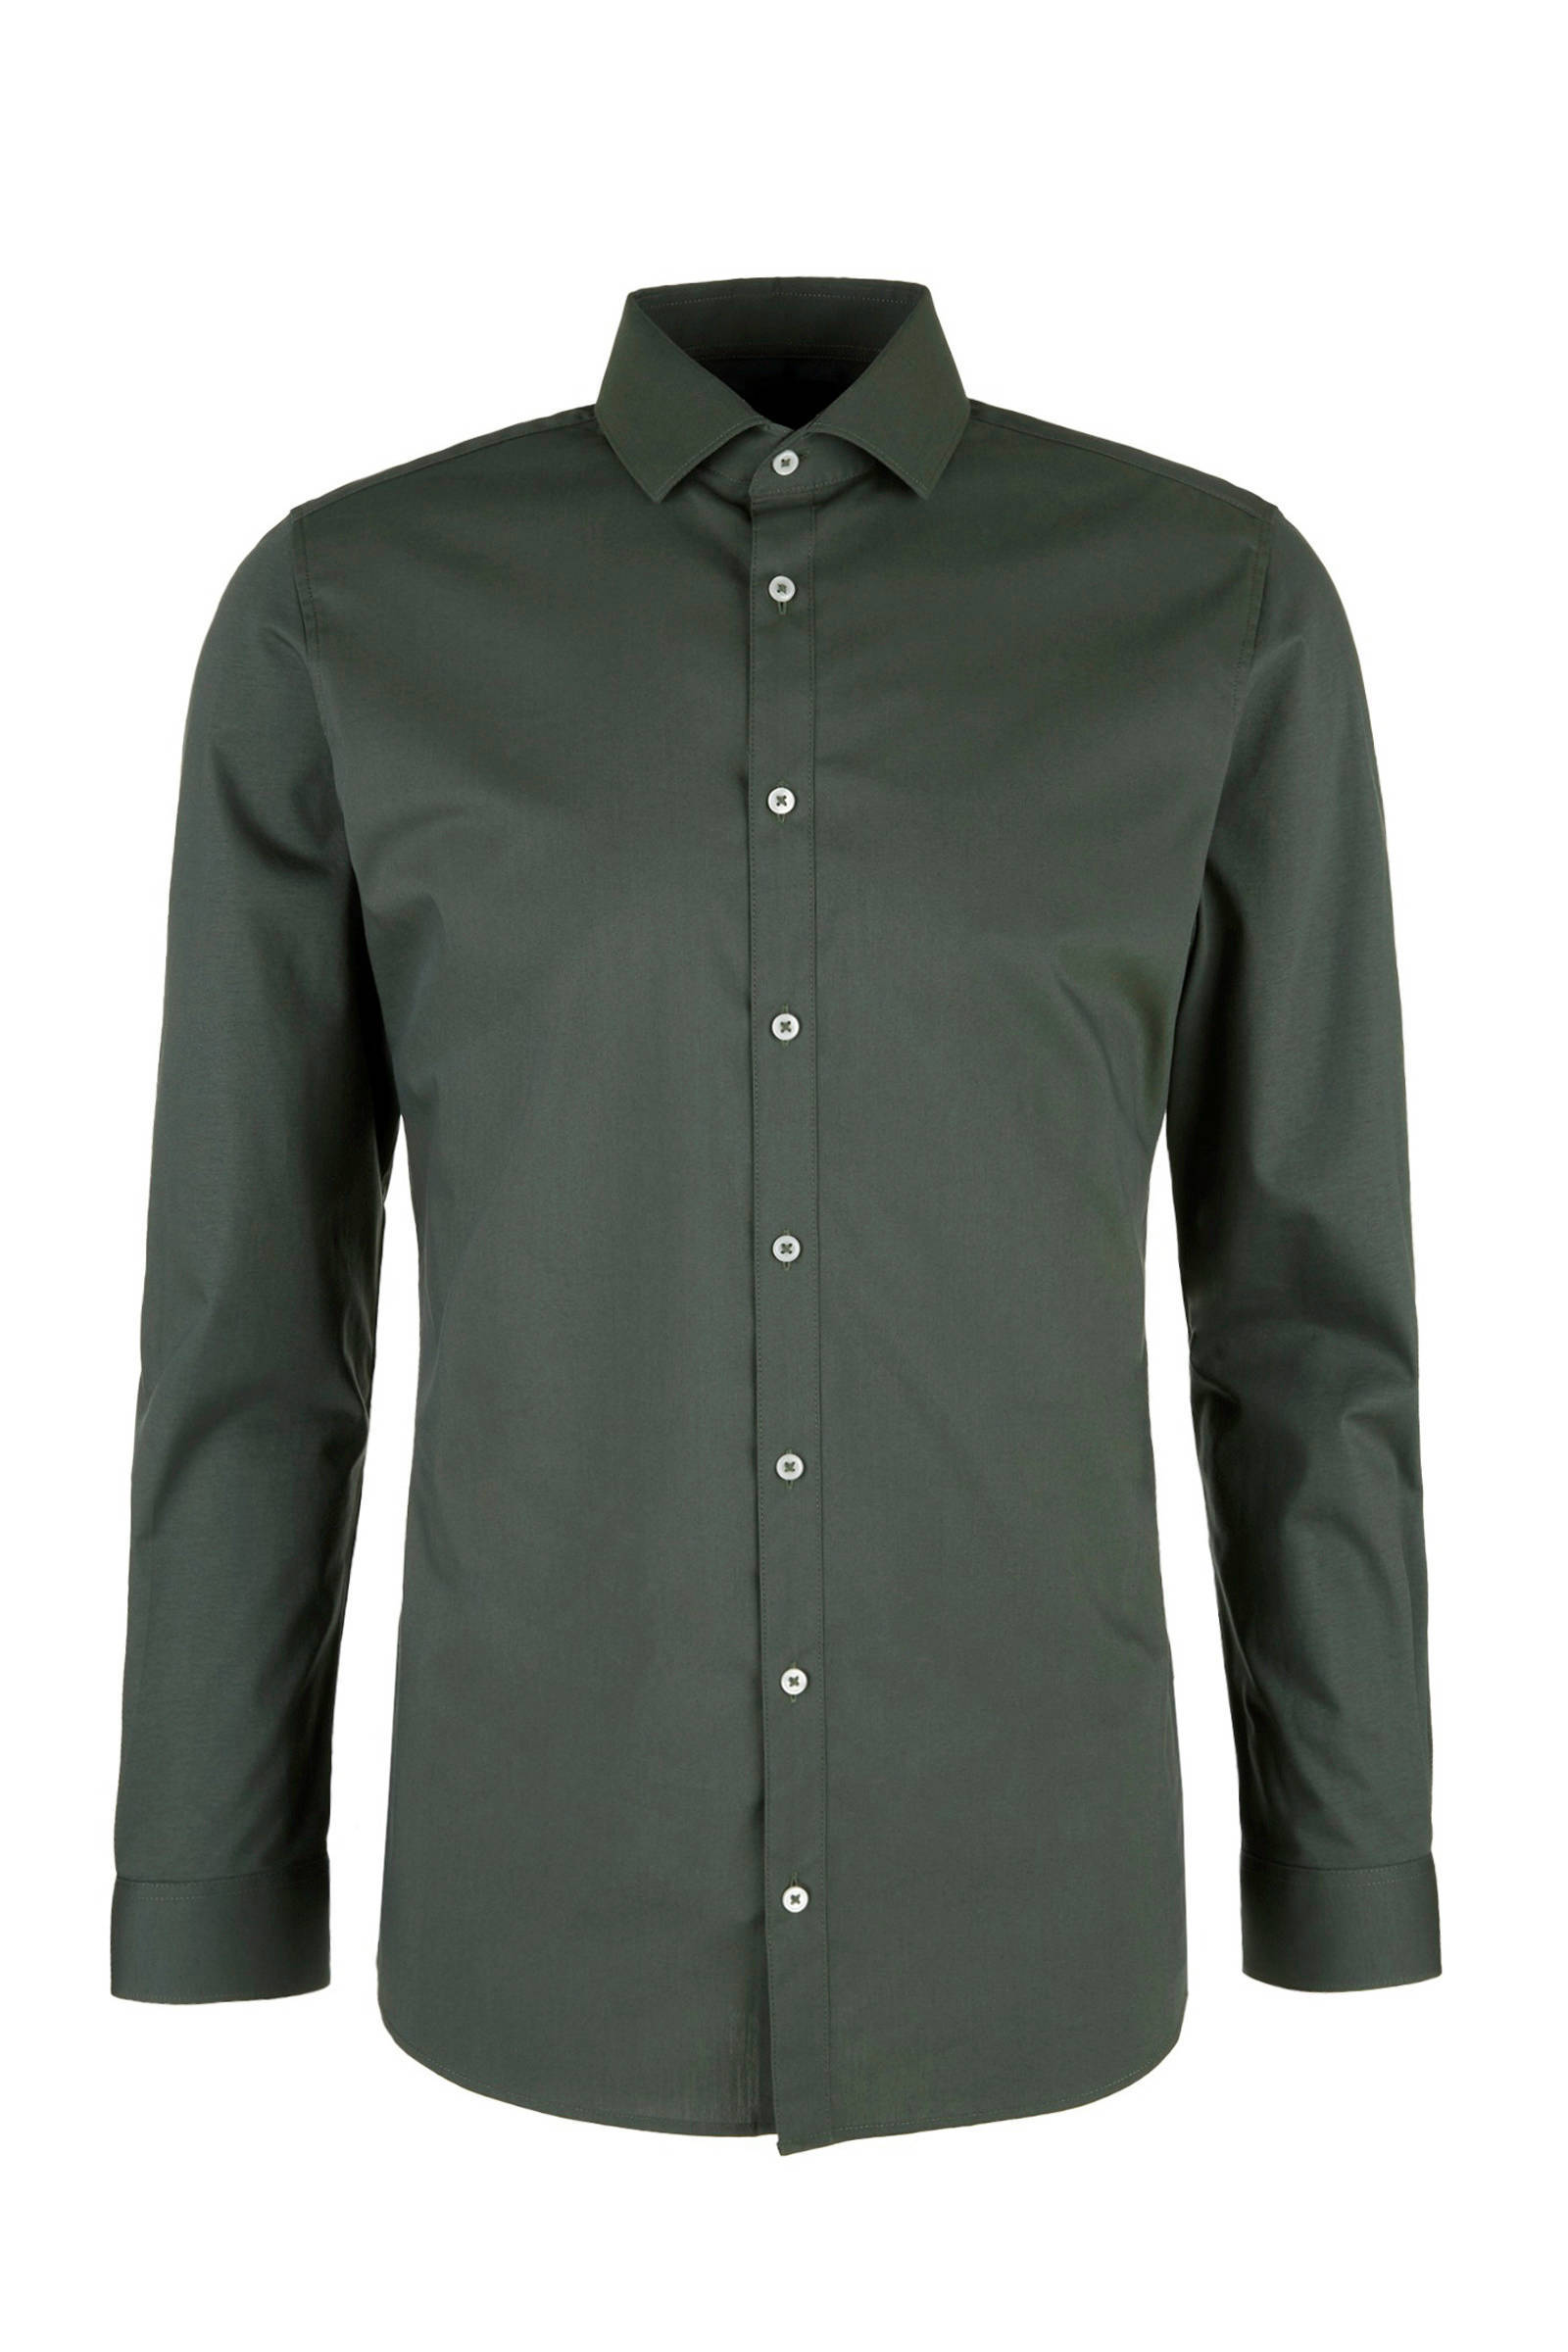 Donkergroen Overhemd.S Oliver Black Label Slim Fit Overhemd Wehkamp